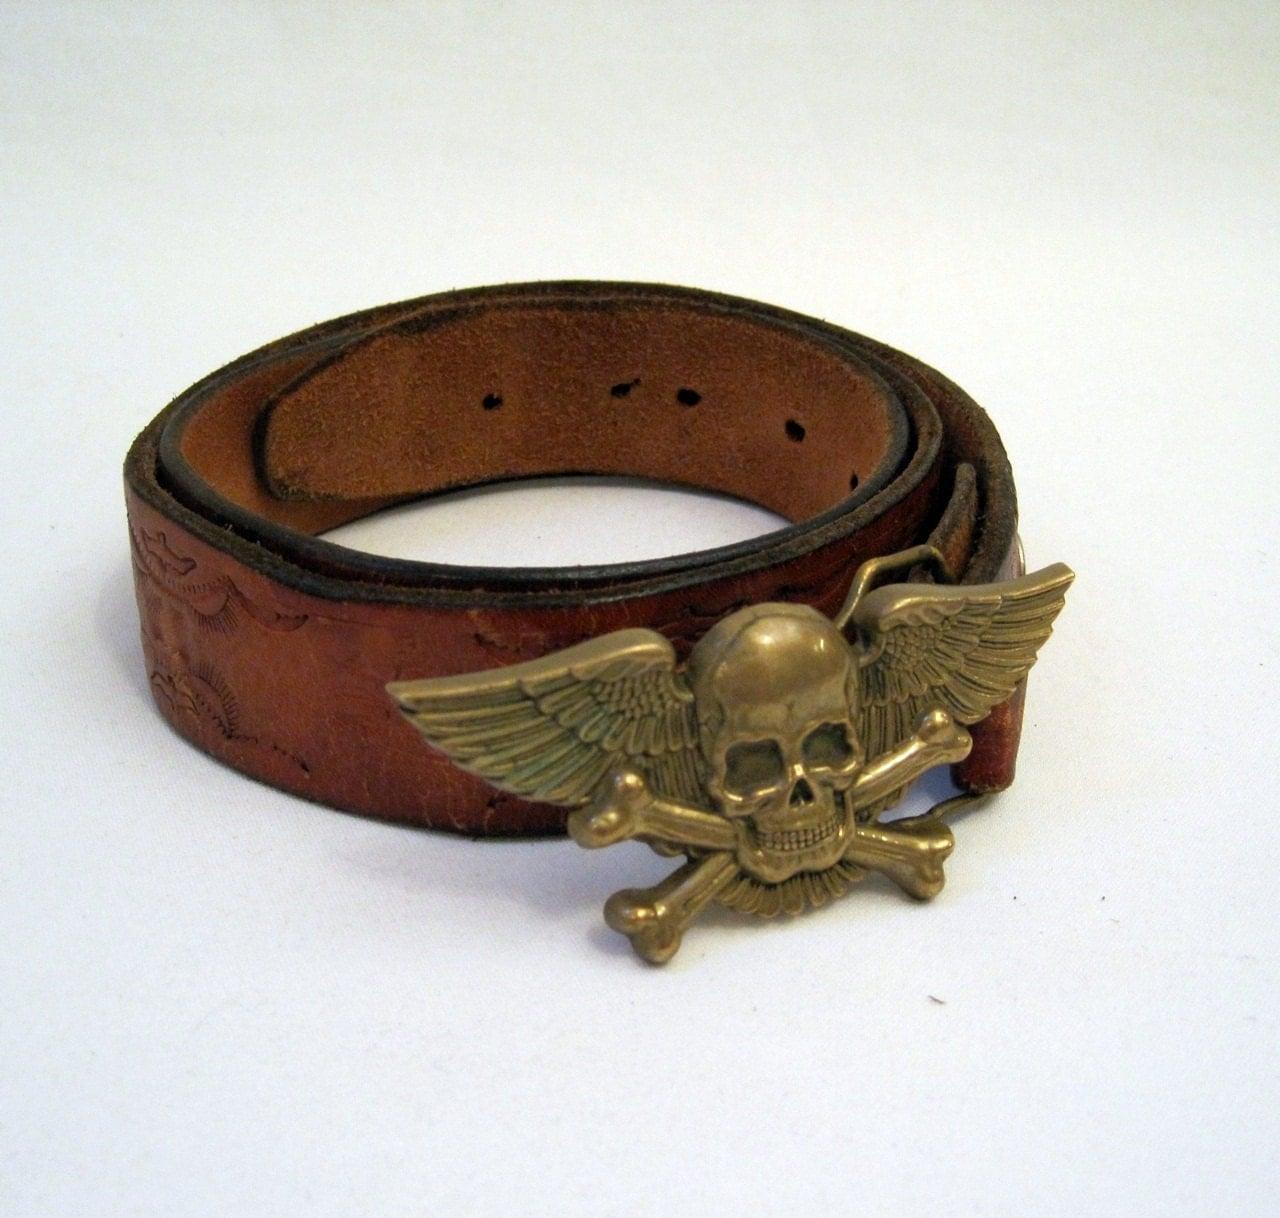 mens belt pirate skull and cross bones vintage tooled leather